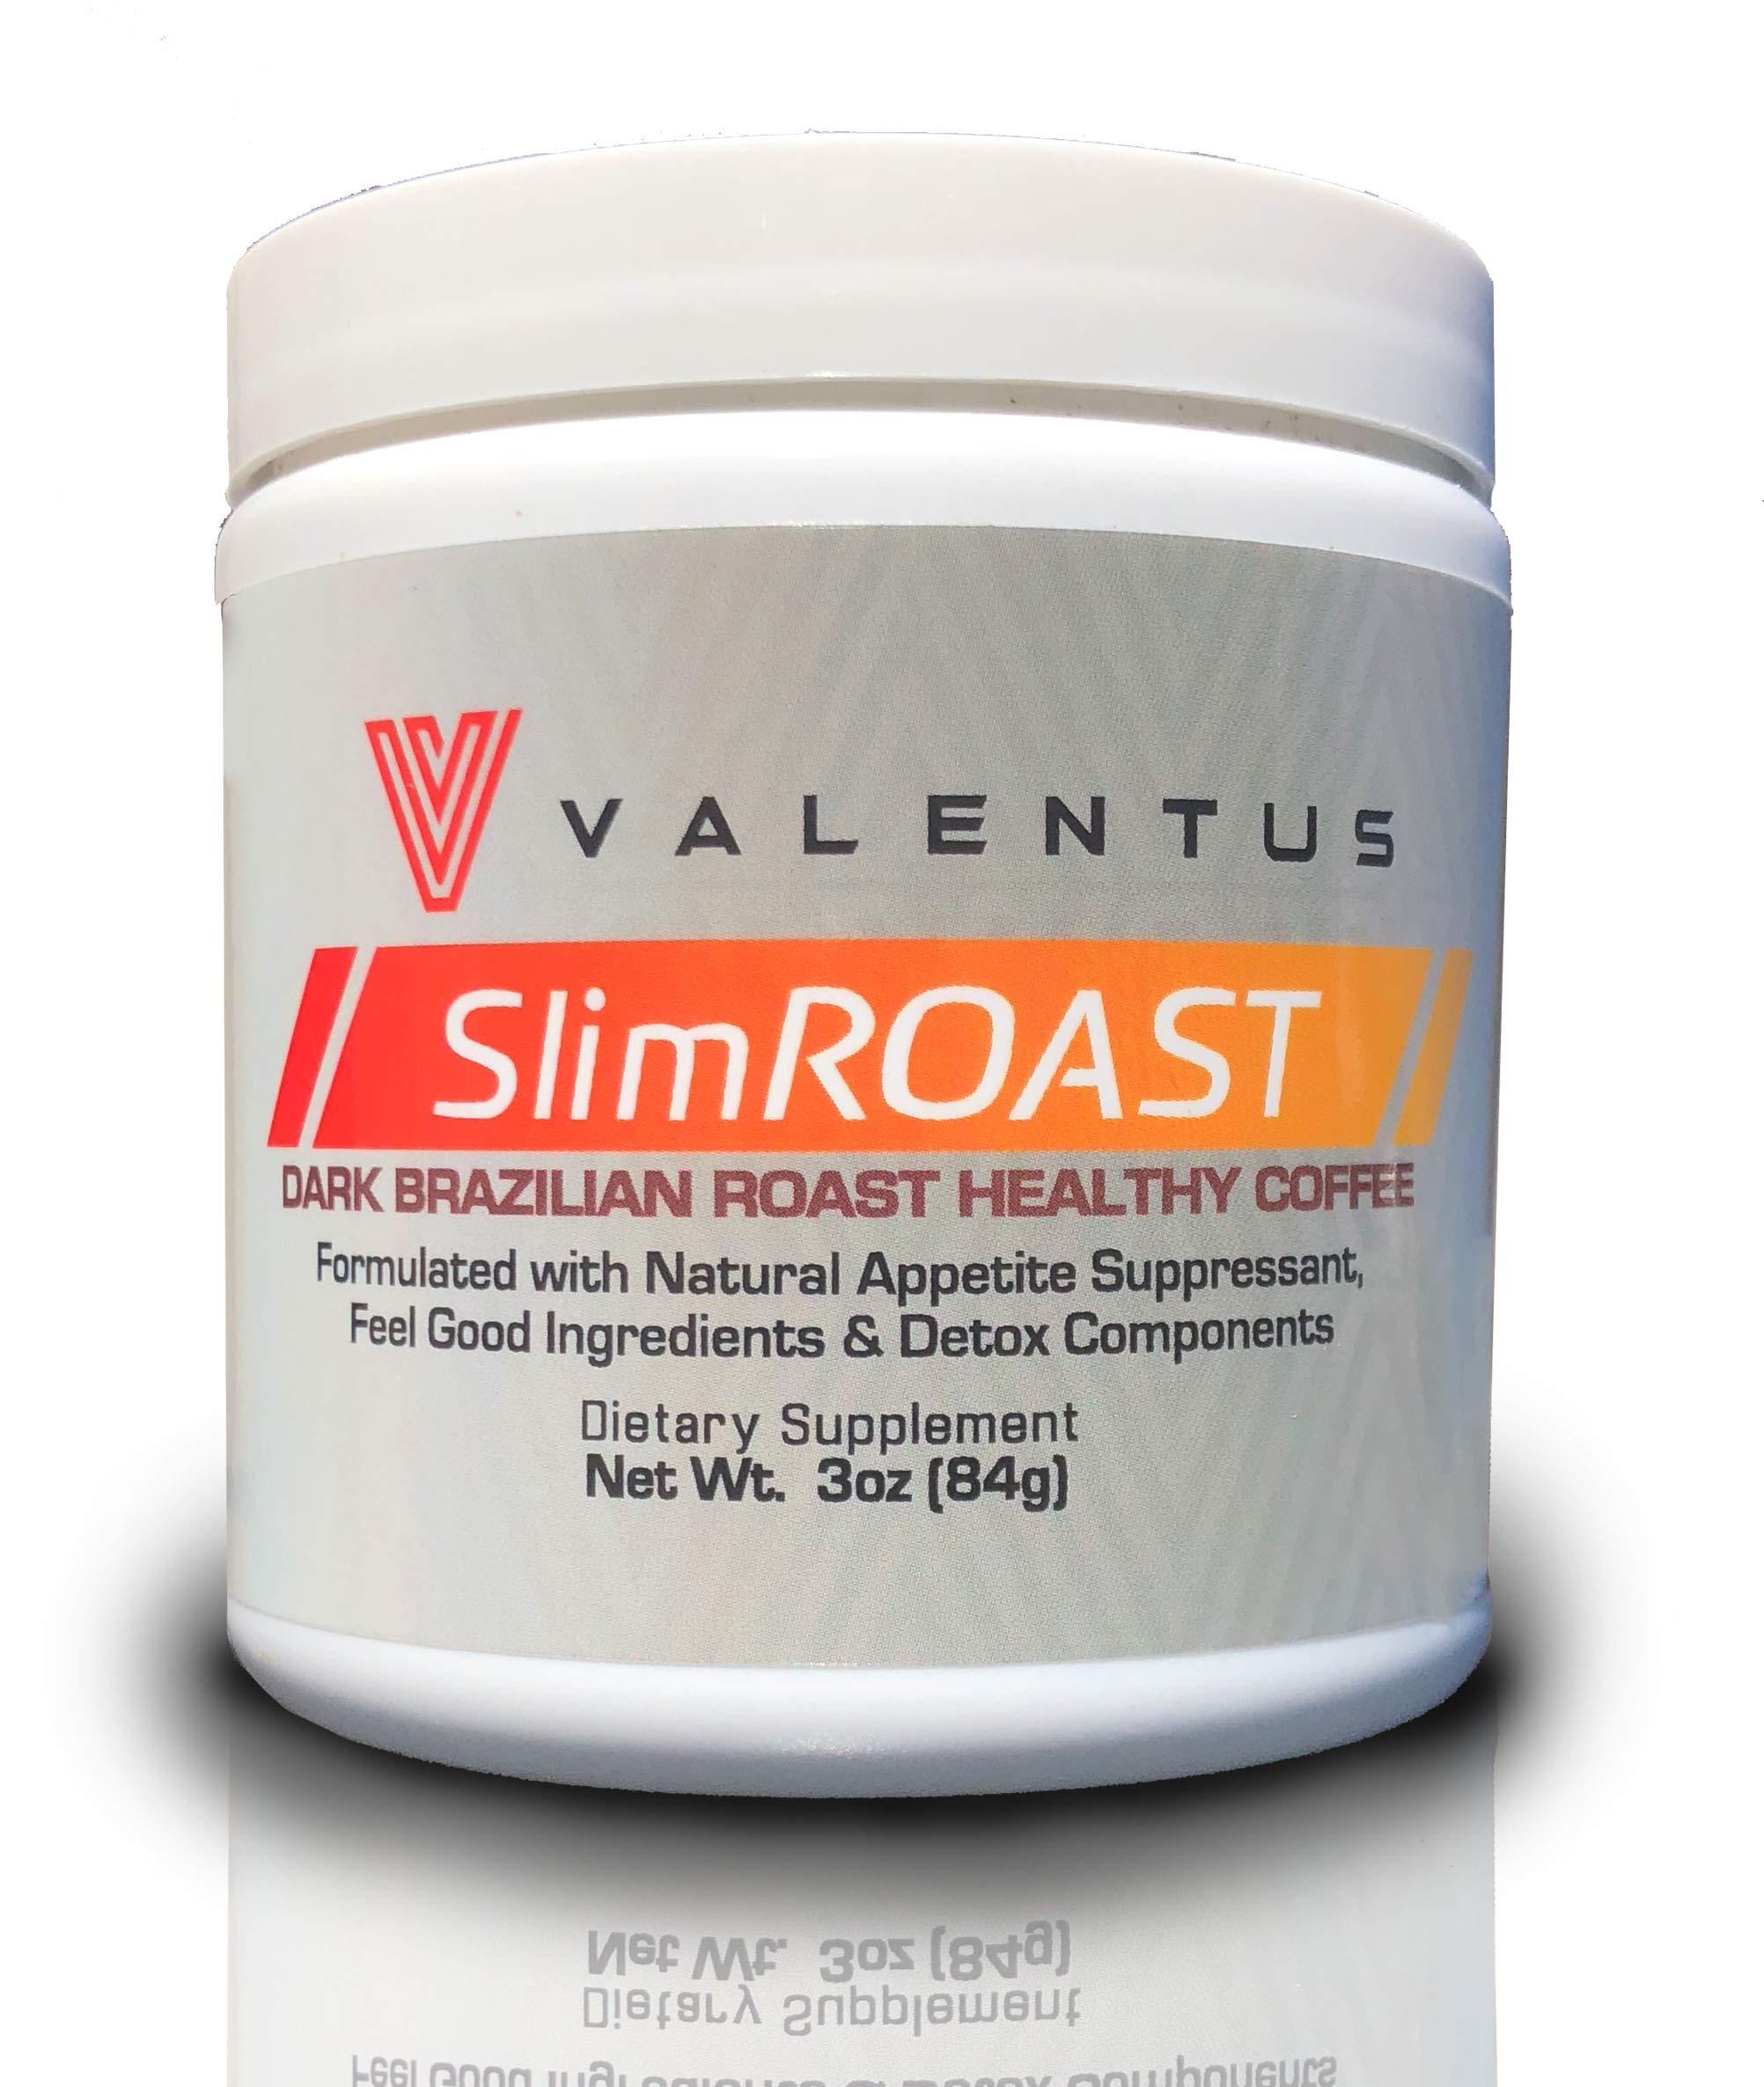 Valentus Brazilian Slim Roast Coffee - Dark Roast 3 Oz. Canister (24 Servings) by VALENTUS